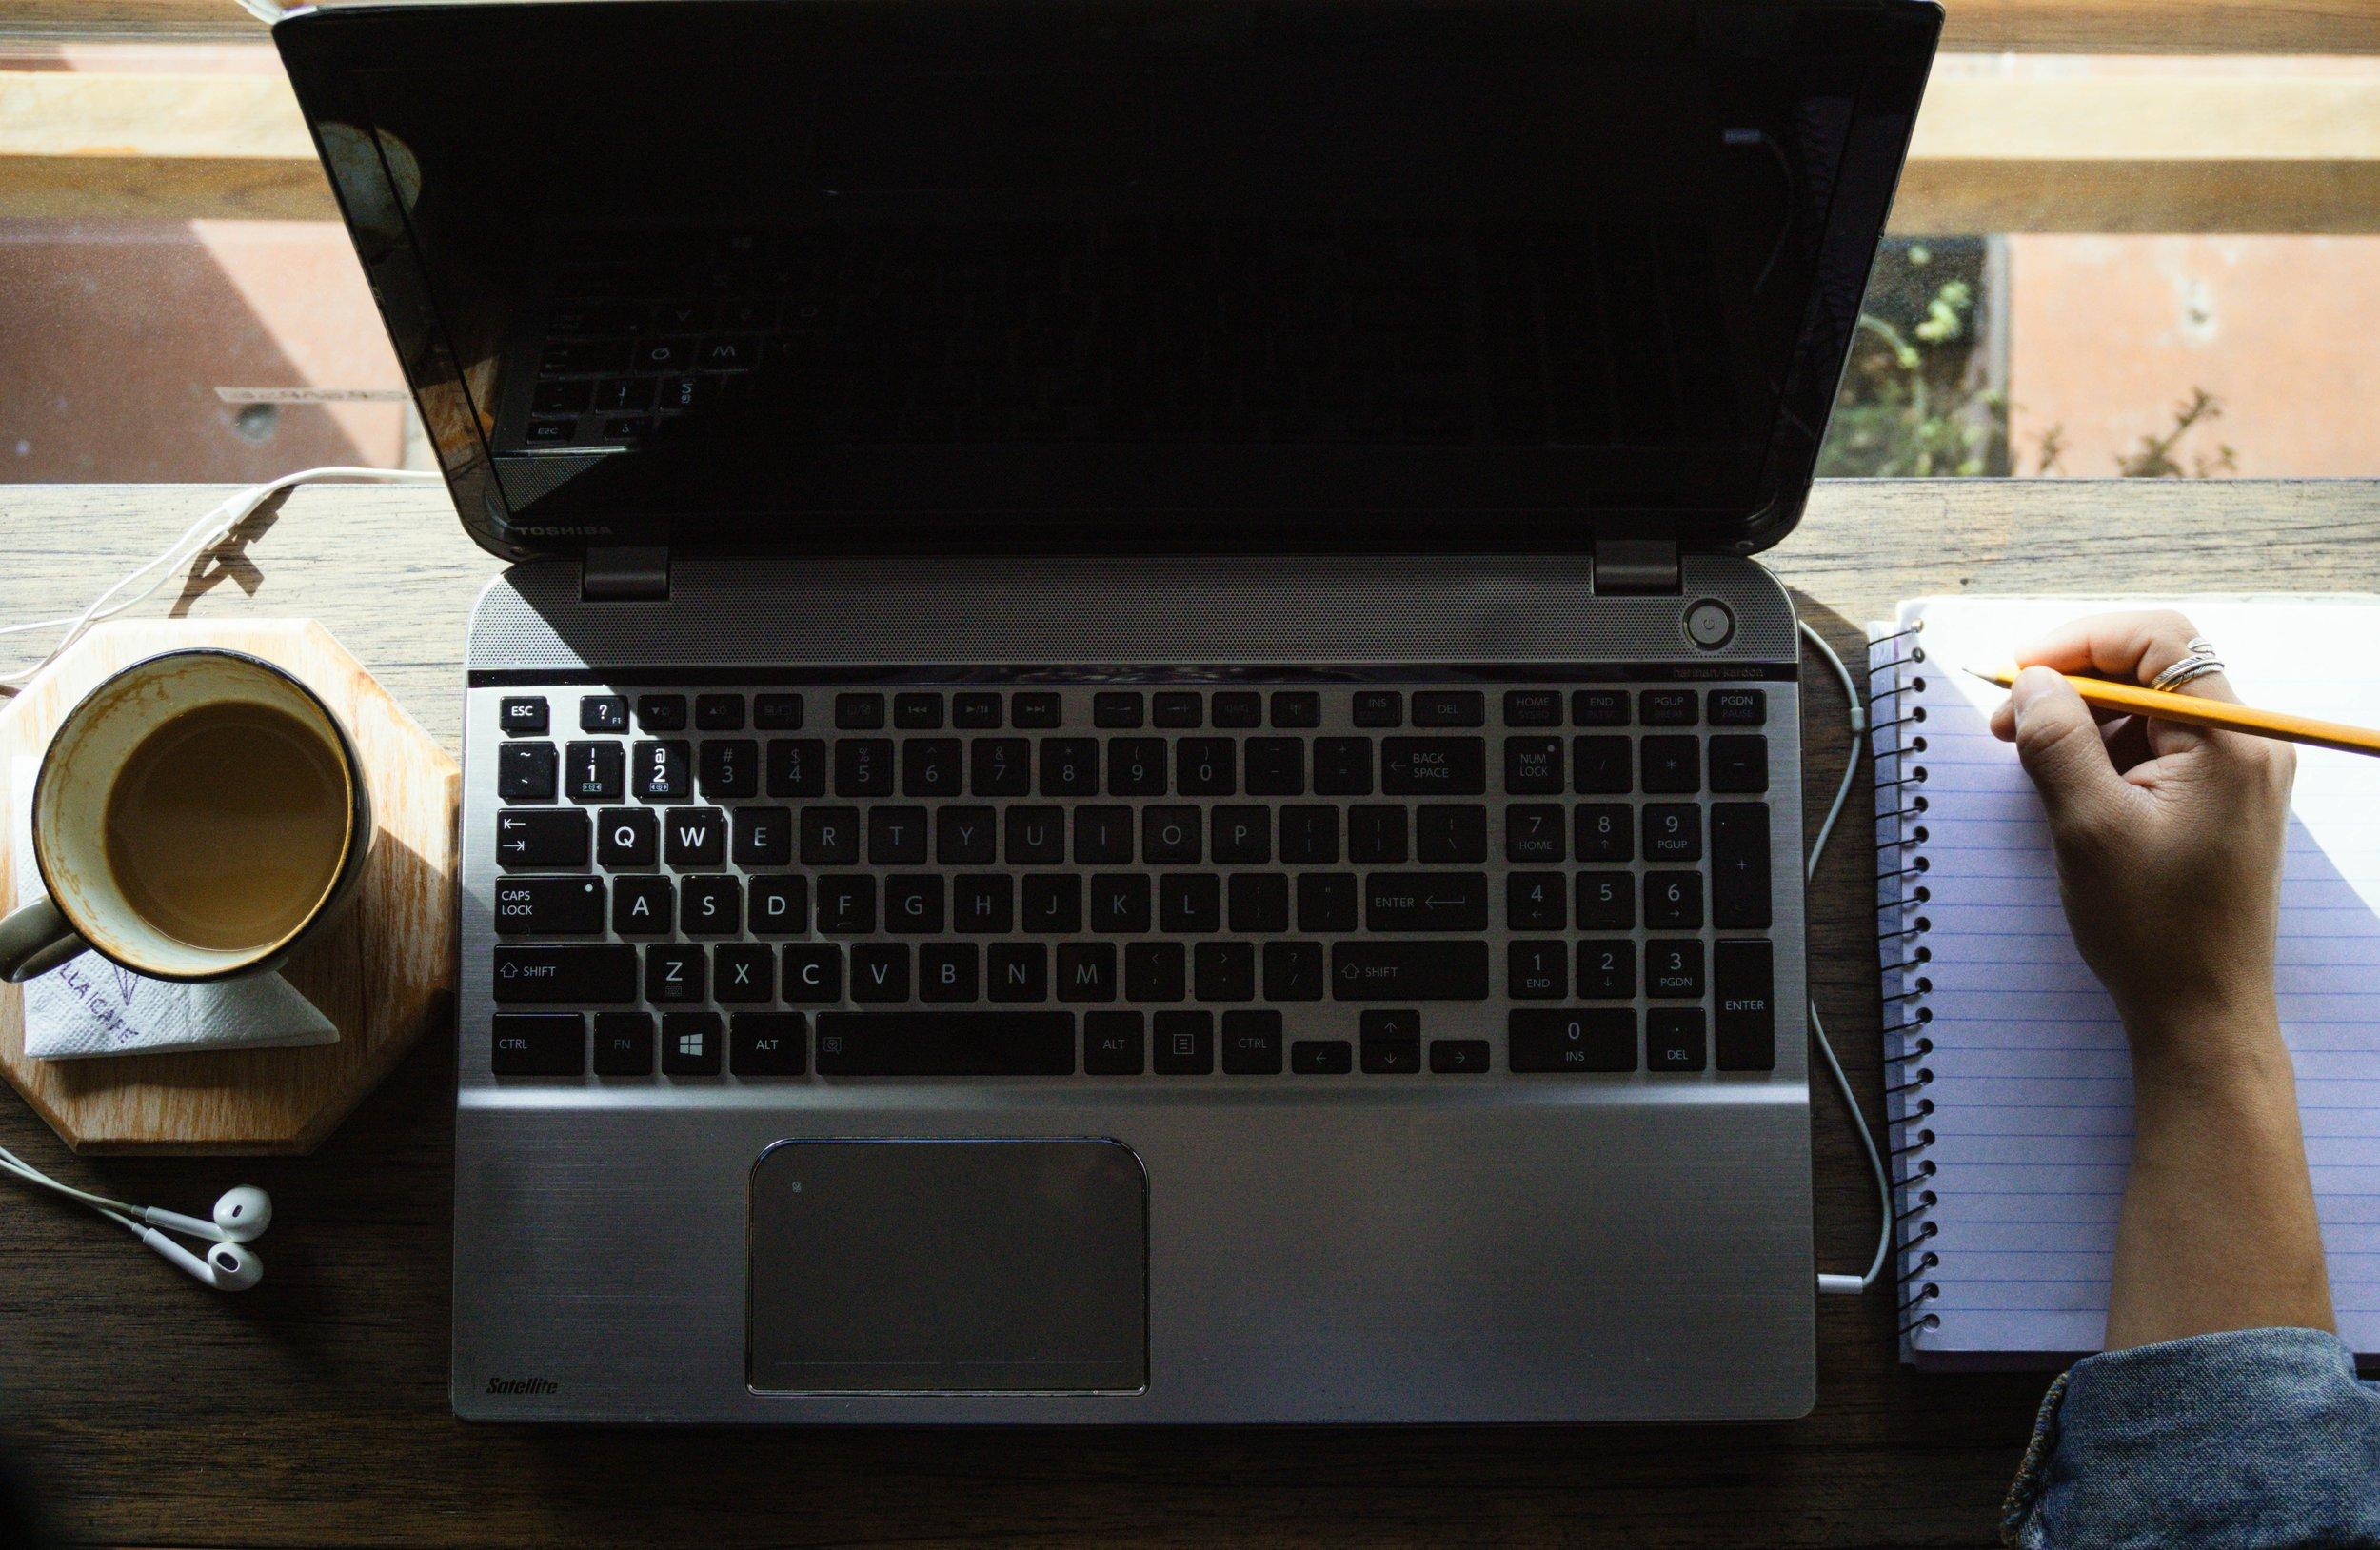 computer journal coffee kat-stokes-1157386-unsplash.jpg